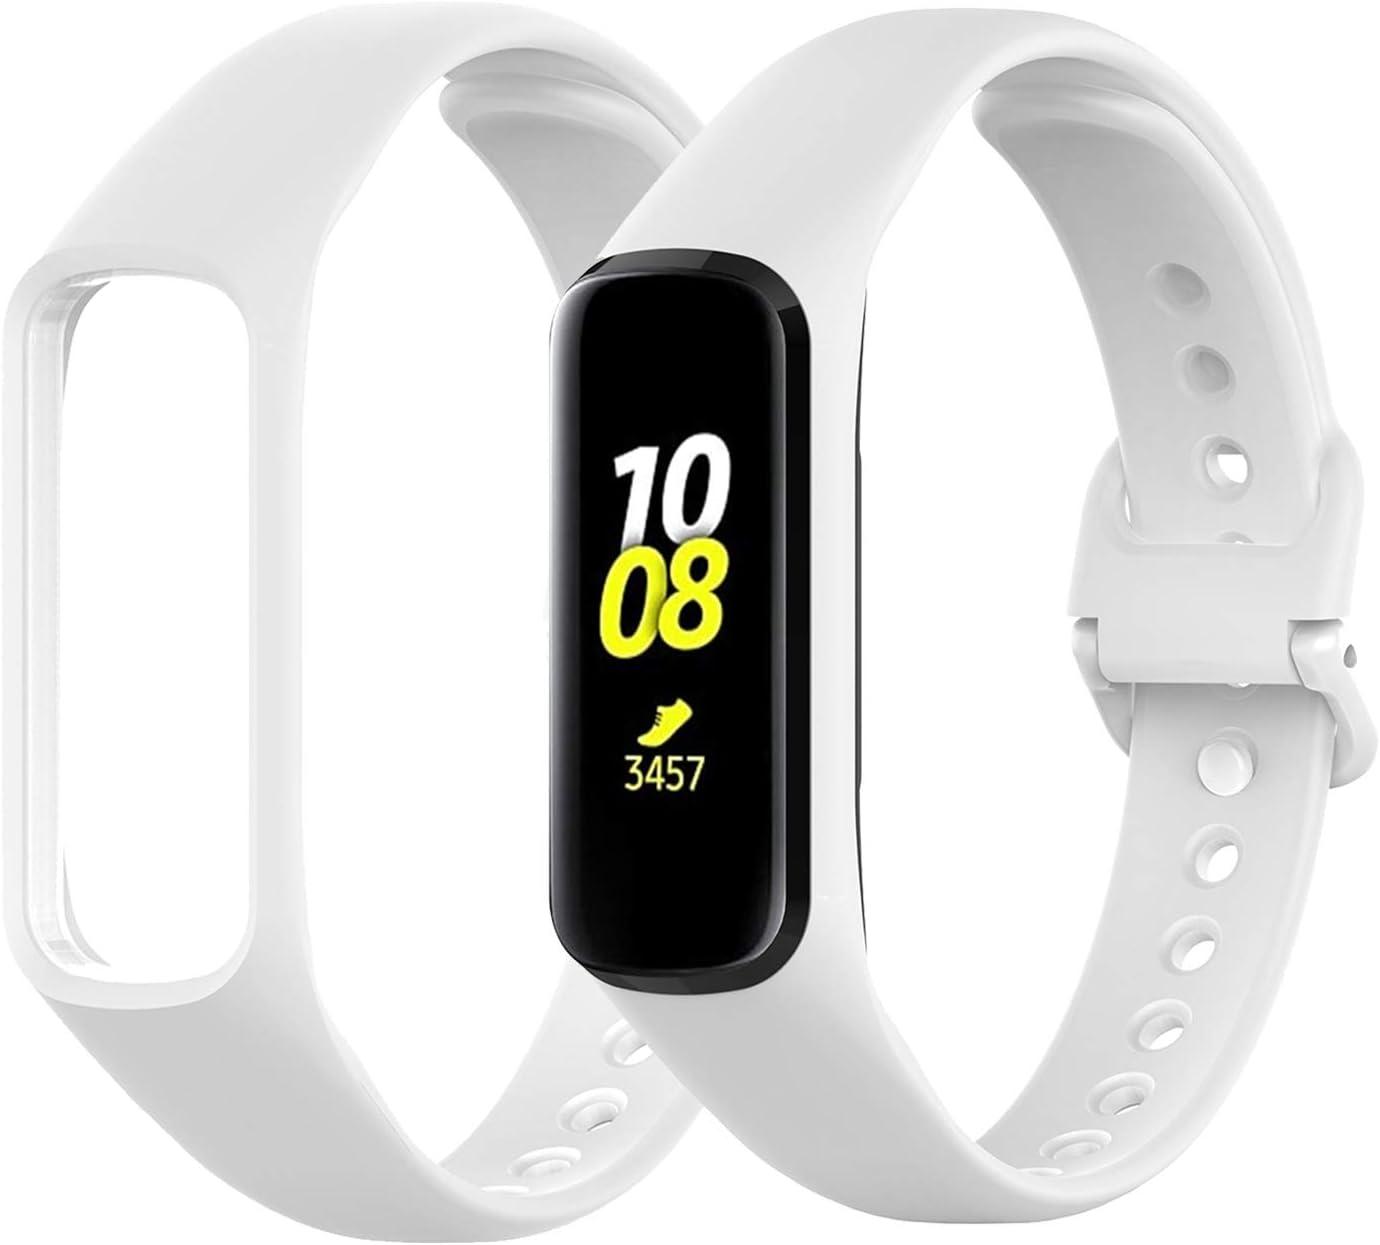 Malla silicona Samsung Galaxy Fit 2 blanca 1 pack